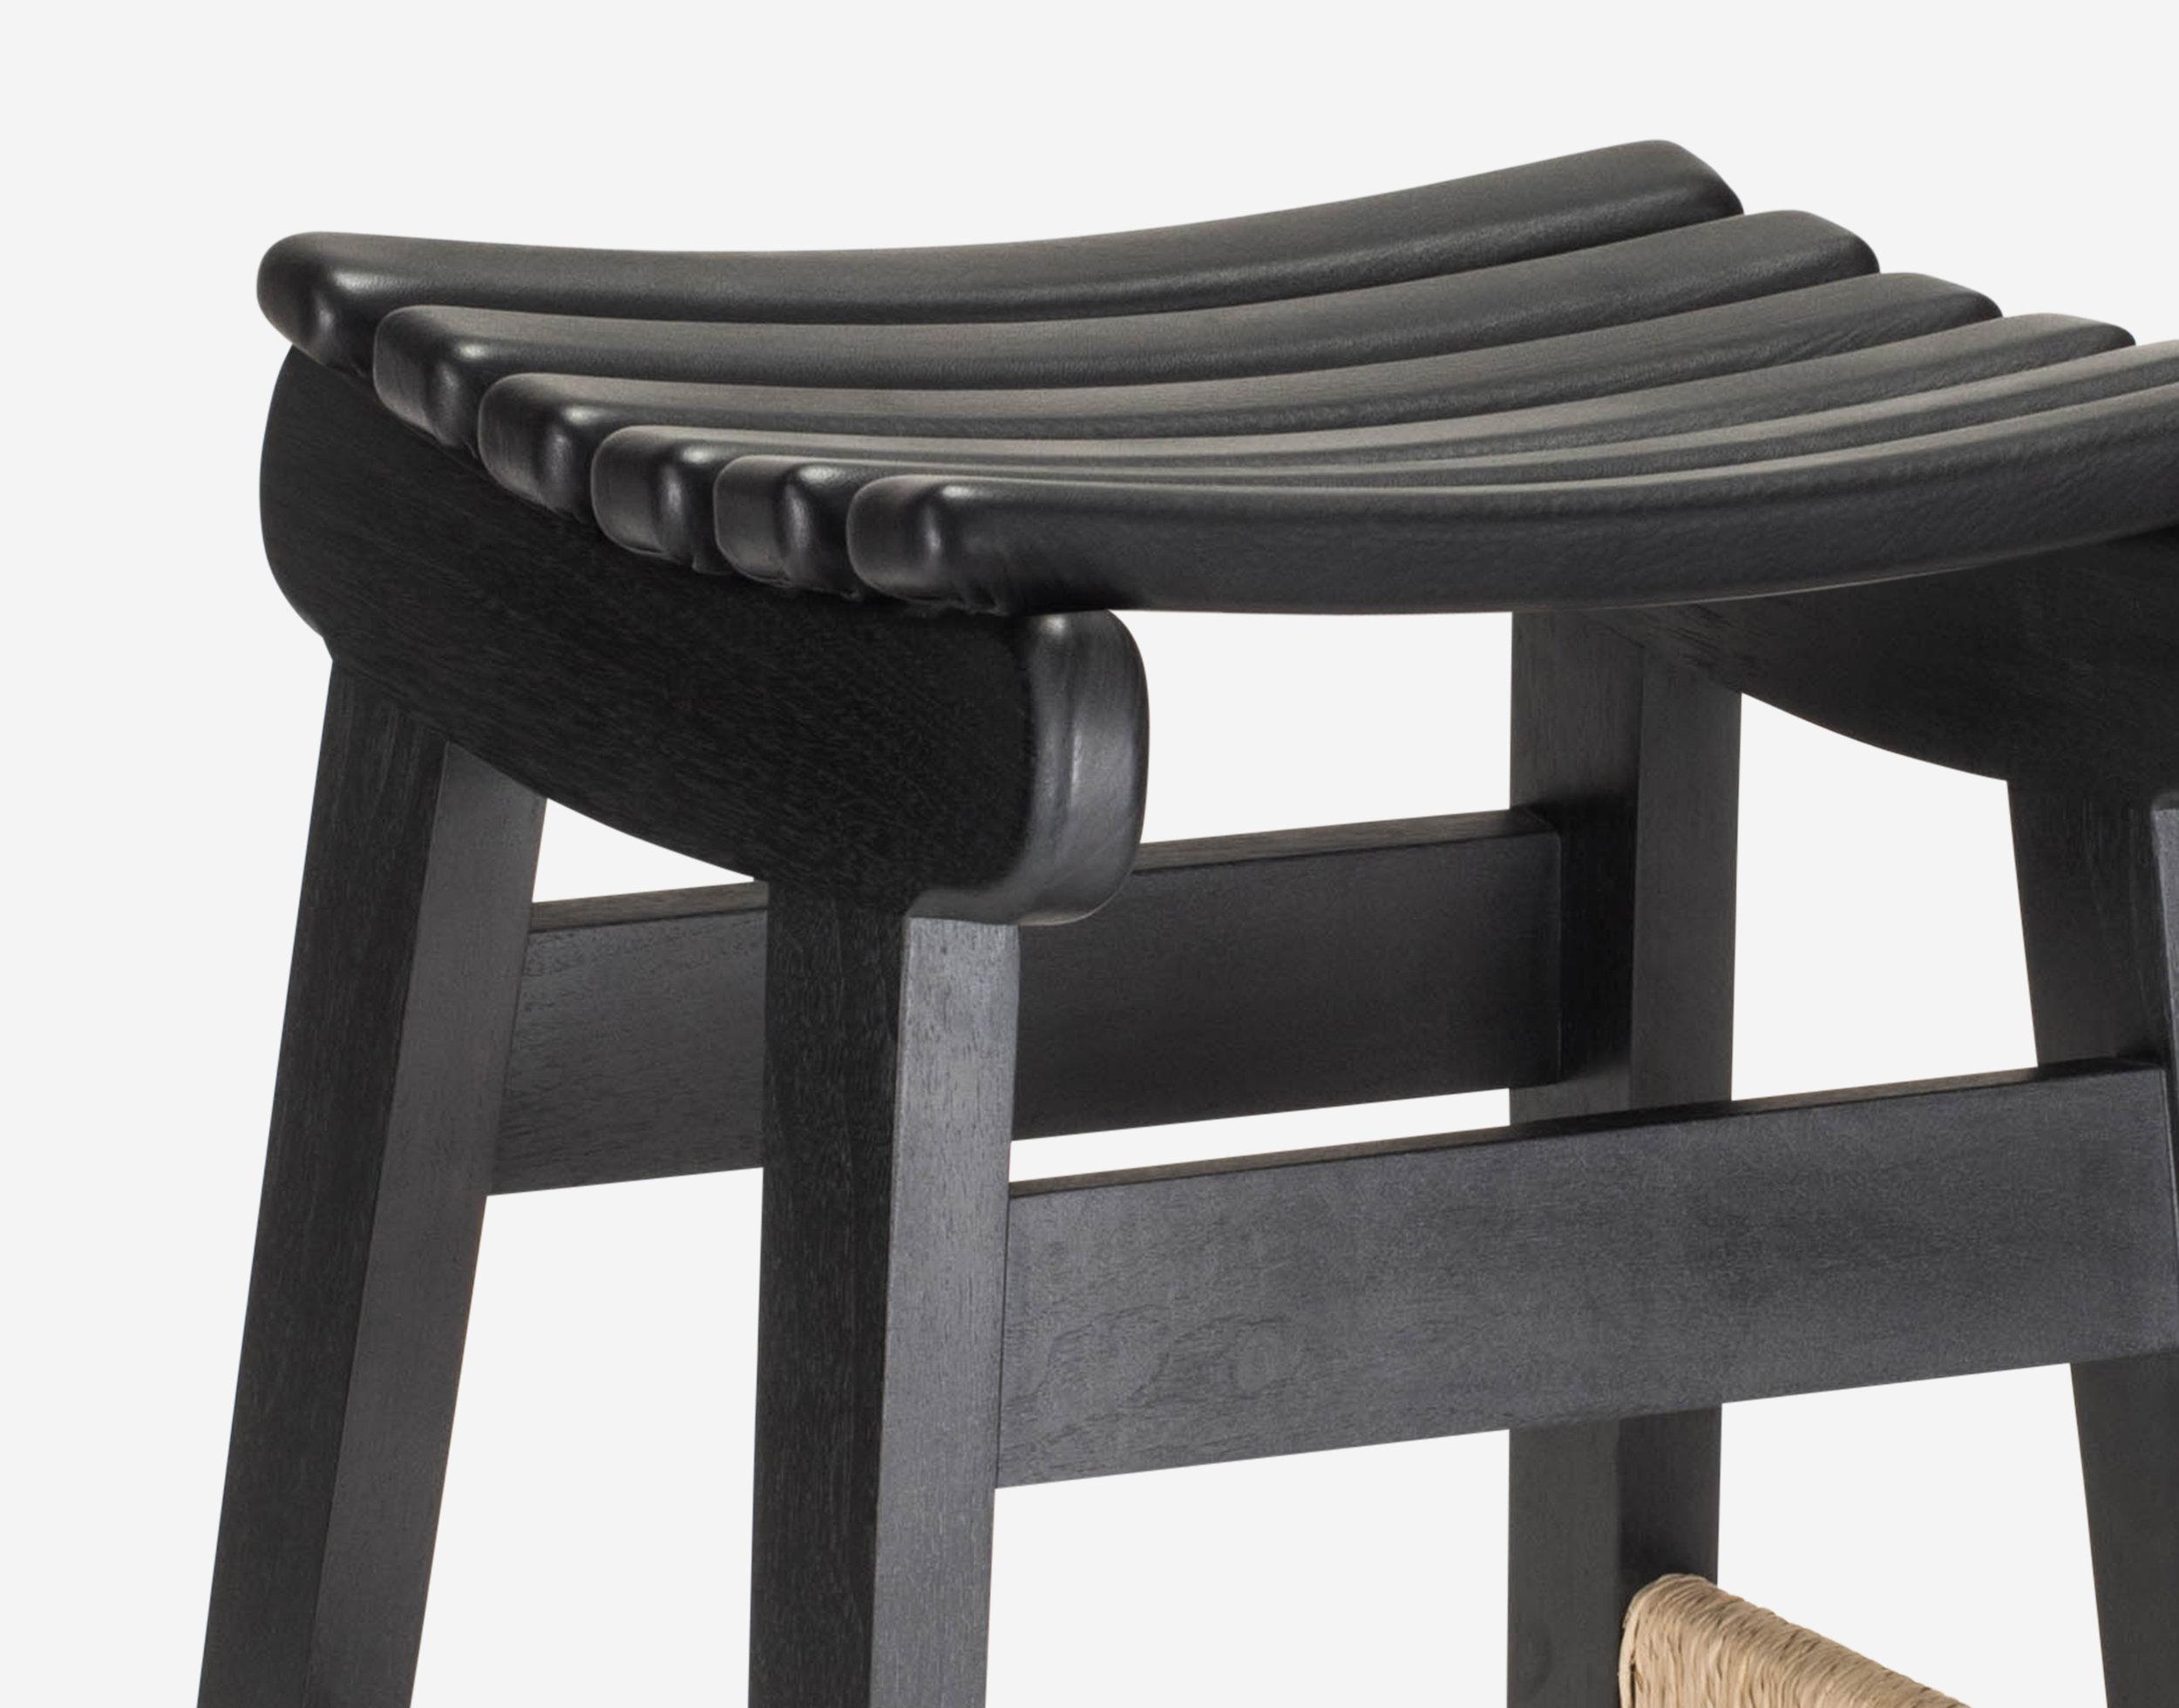 Luteca_MvB_San Miguelito-Counter-Stool_Black Oil Walnut-Black-Leather_D-W.jpg